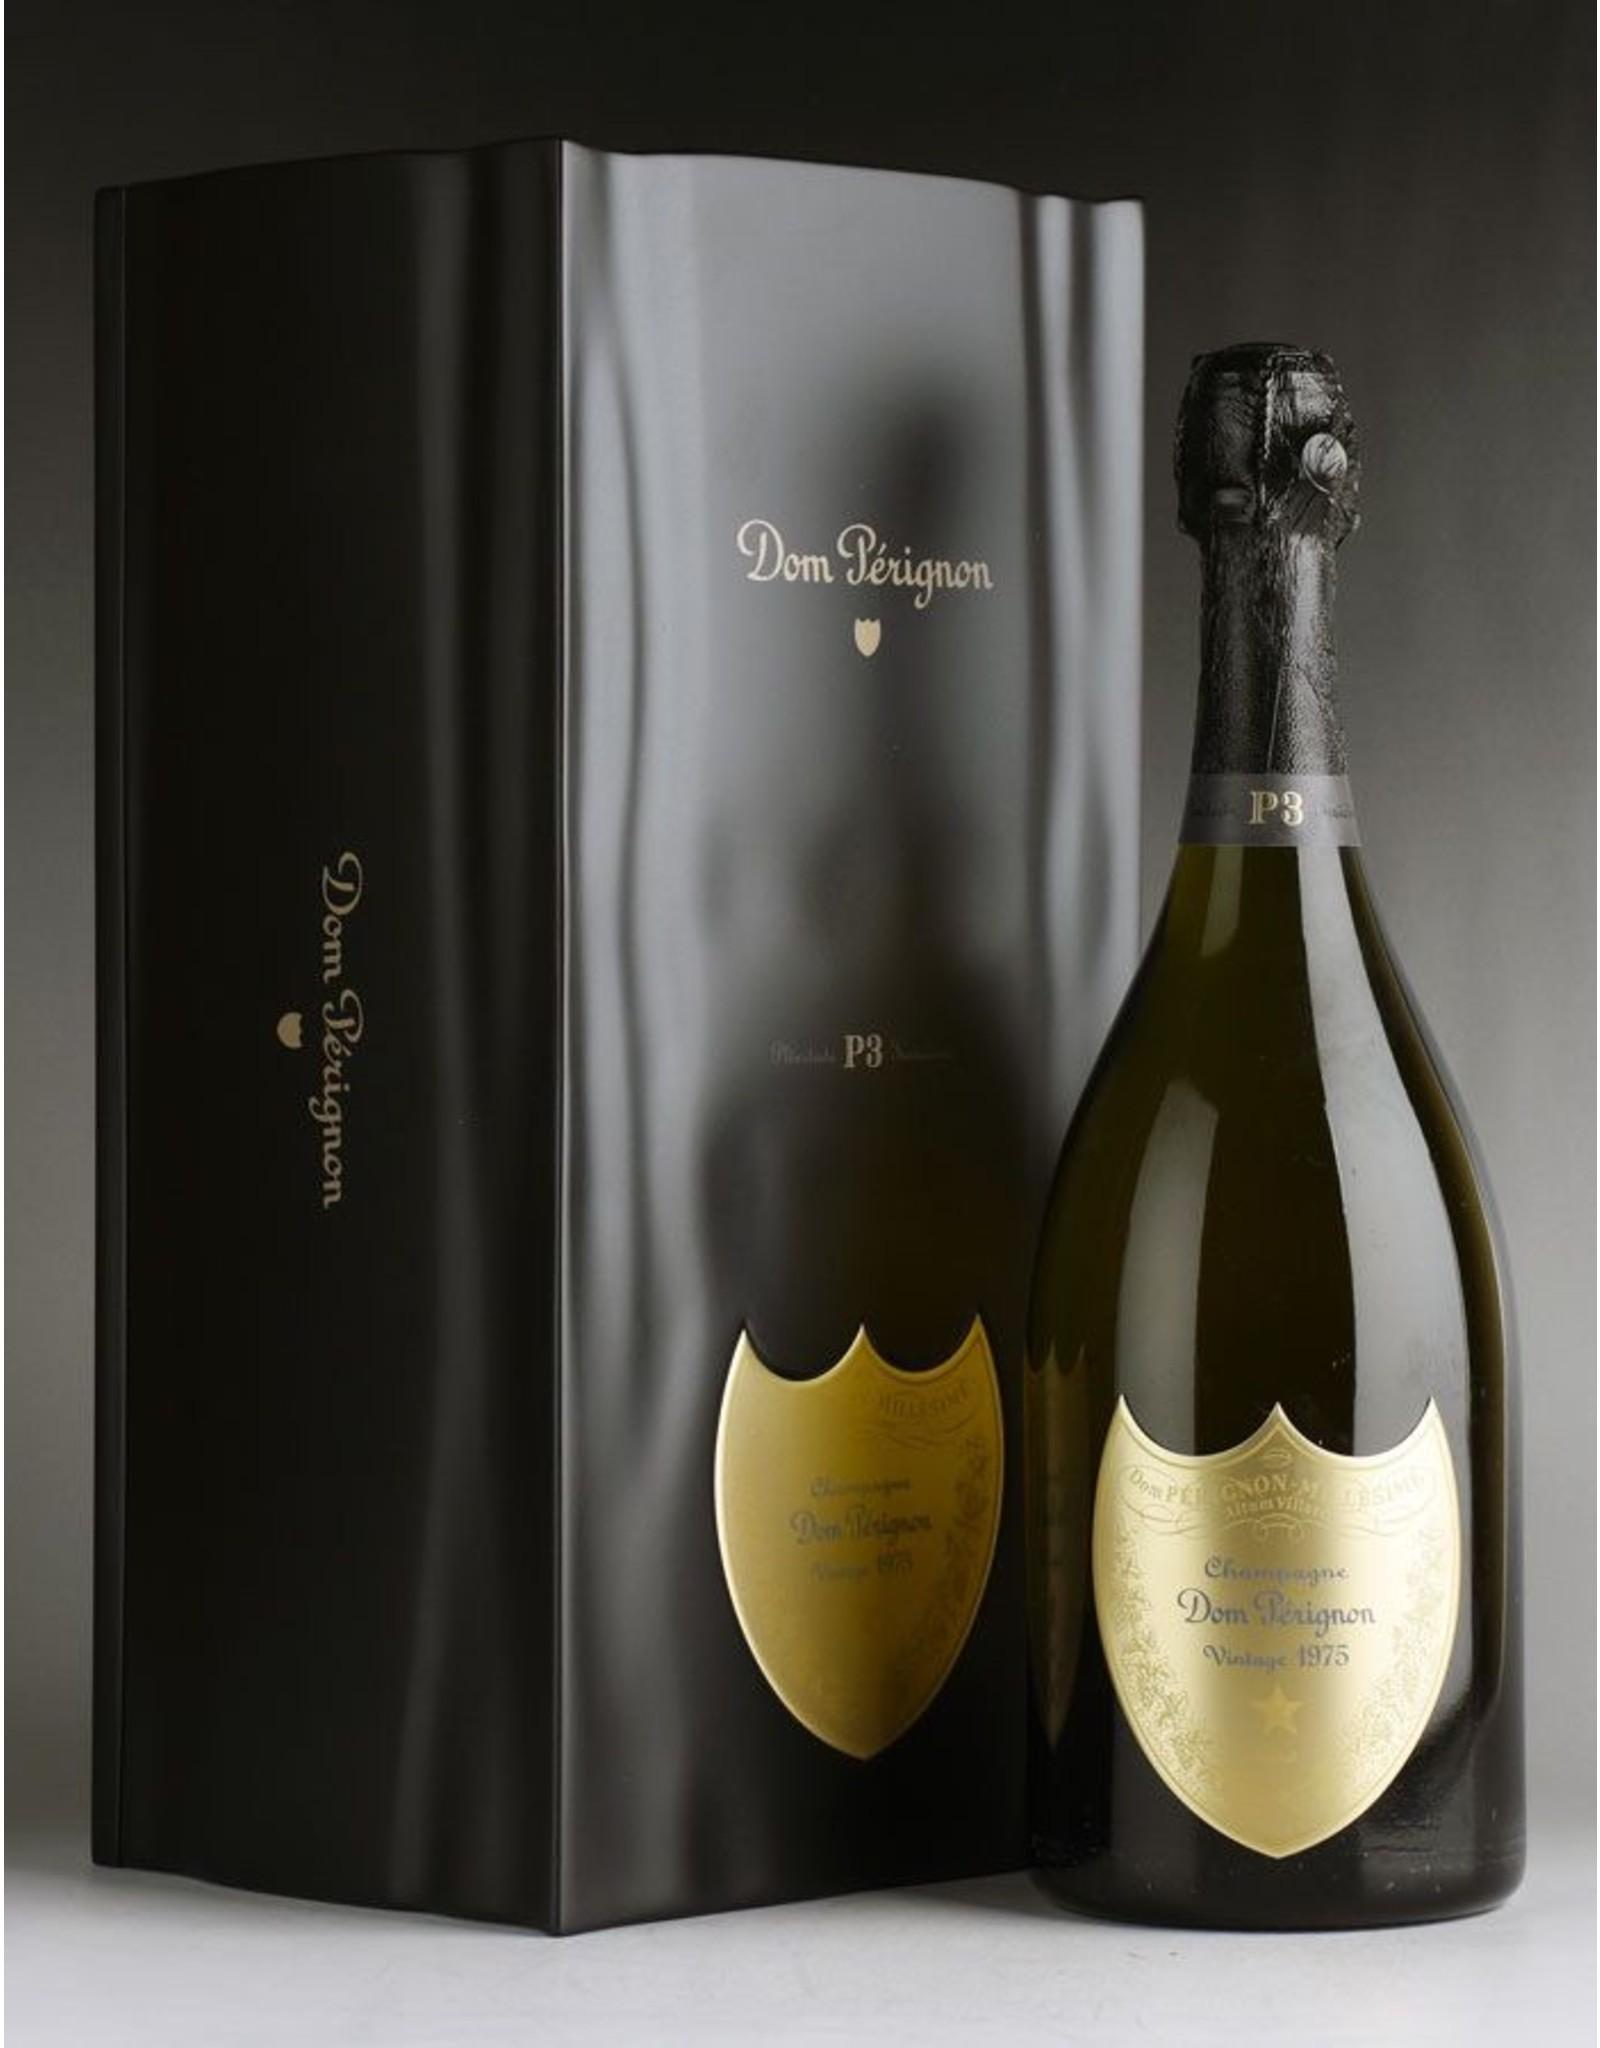 Sparkling Wine 1975, Vintage Dom Perignon P3 Plentitude Brut, Champagne, Epernay, Champagne, France, 12.5% Alc, CT97 JS97 RP96